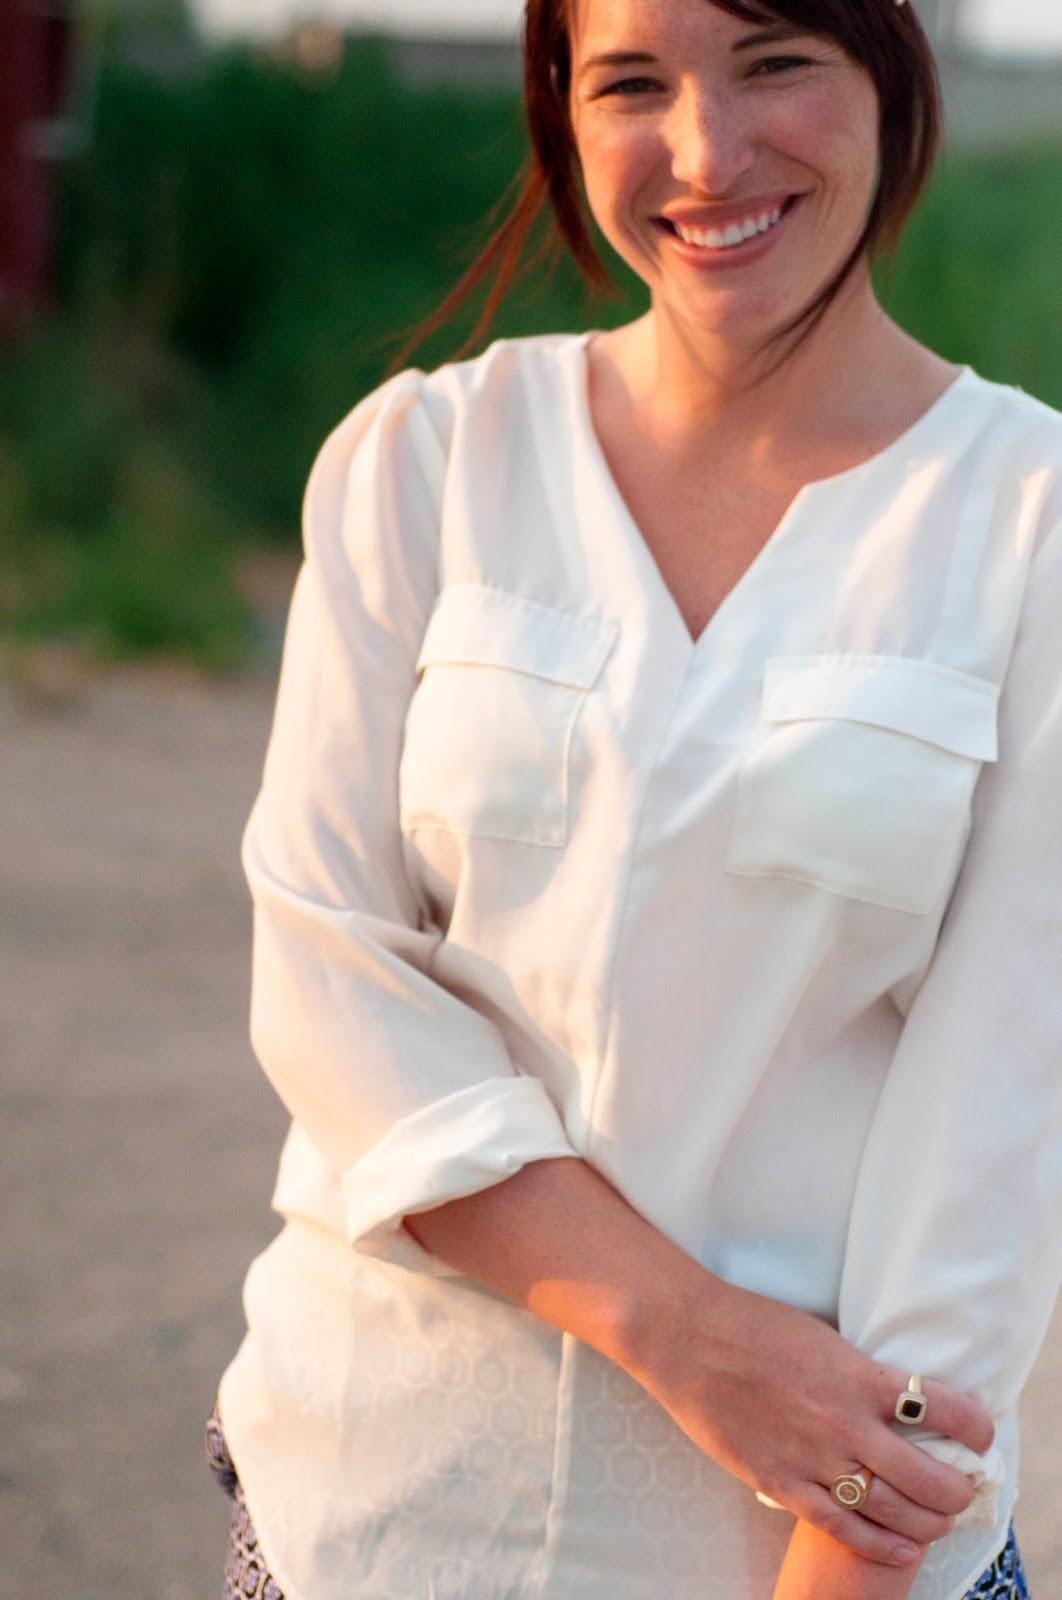 fashion blog, style blog, target style, white blouse, target clothing, ootd, kelsey bang, utah style blogger